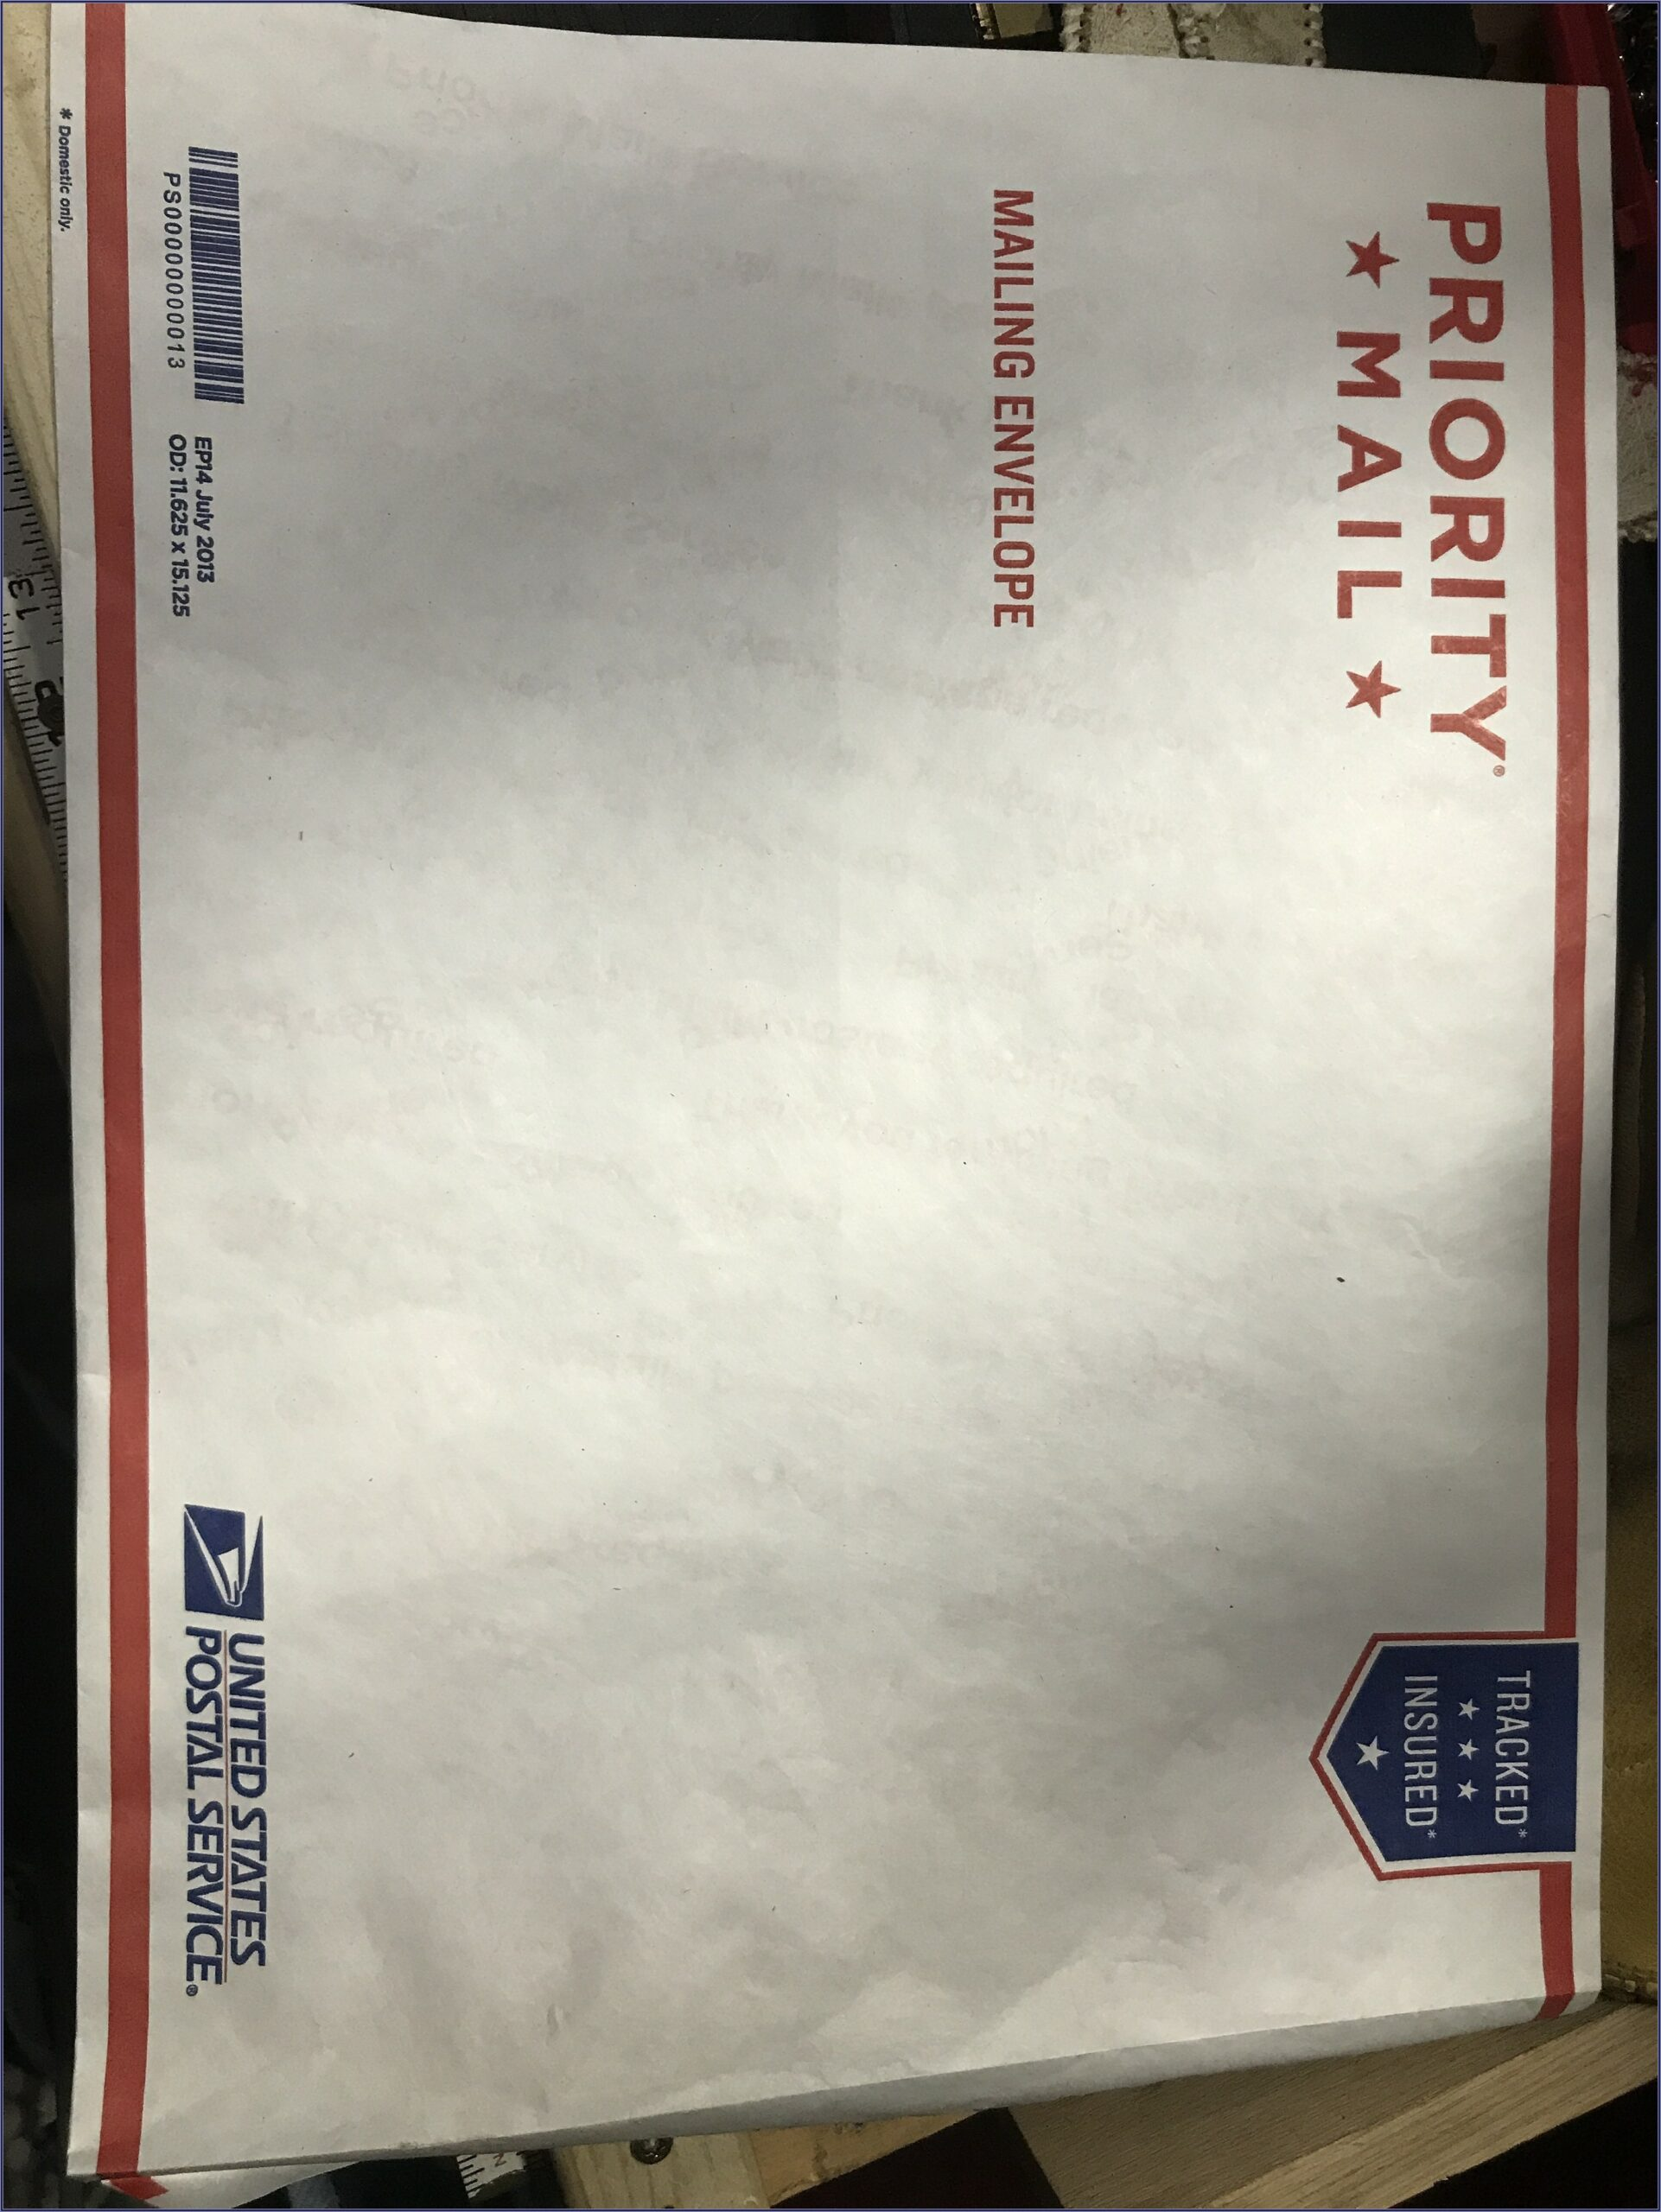 Usps Flat Rate Envelope Sizes